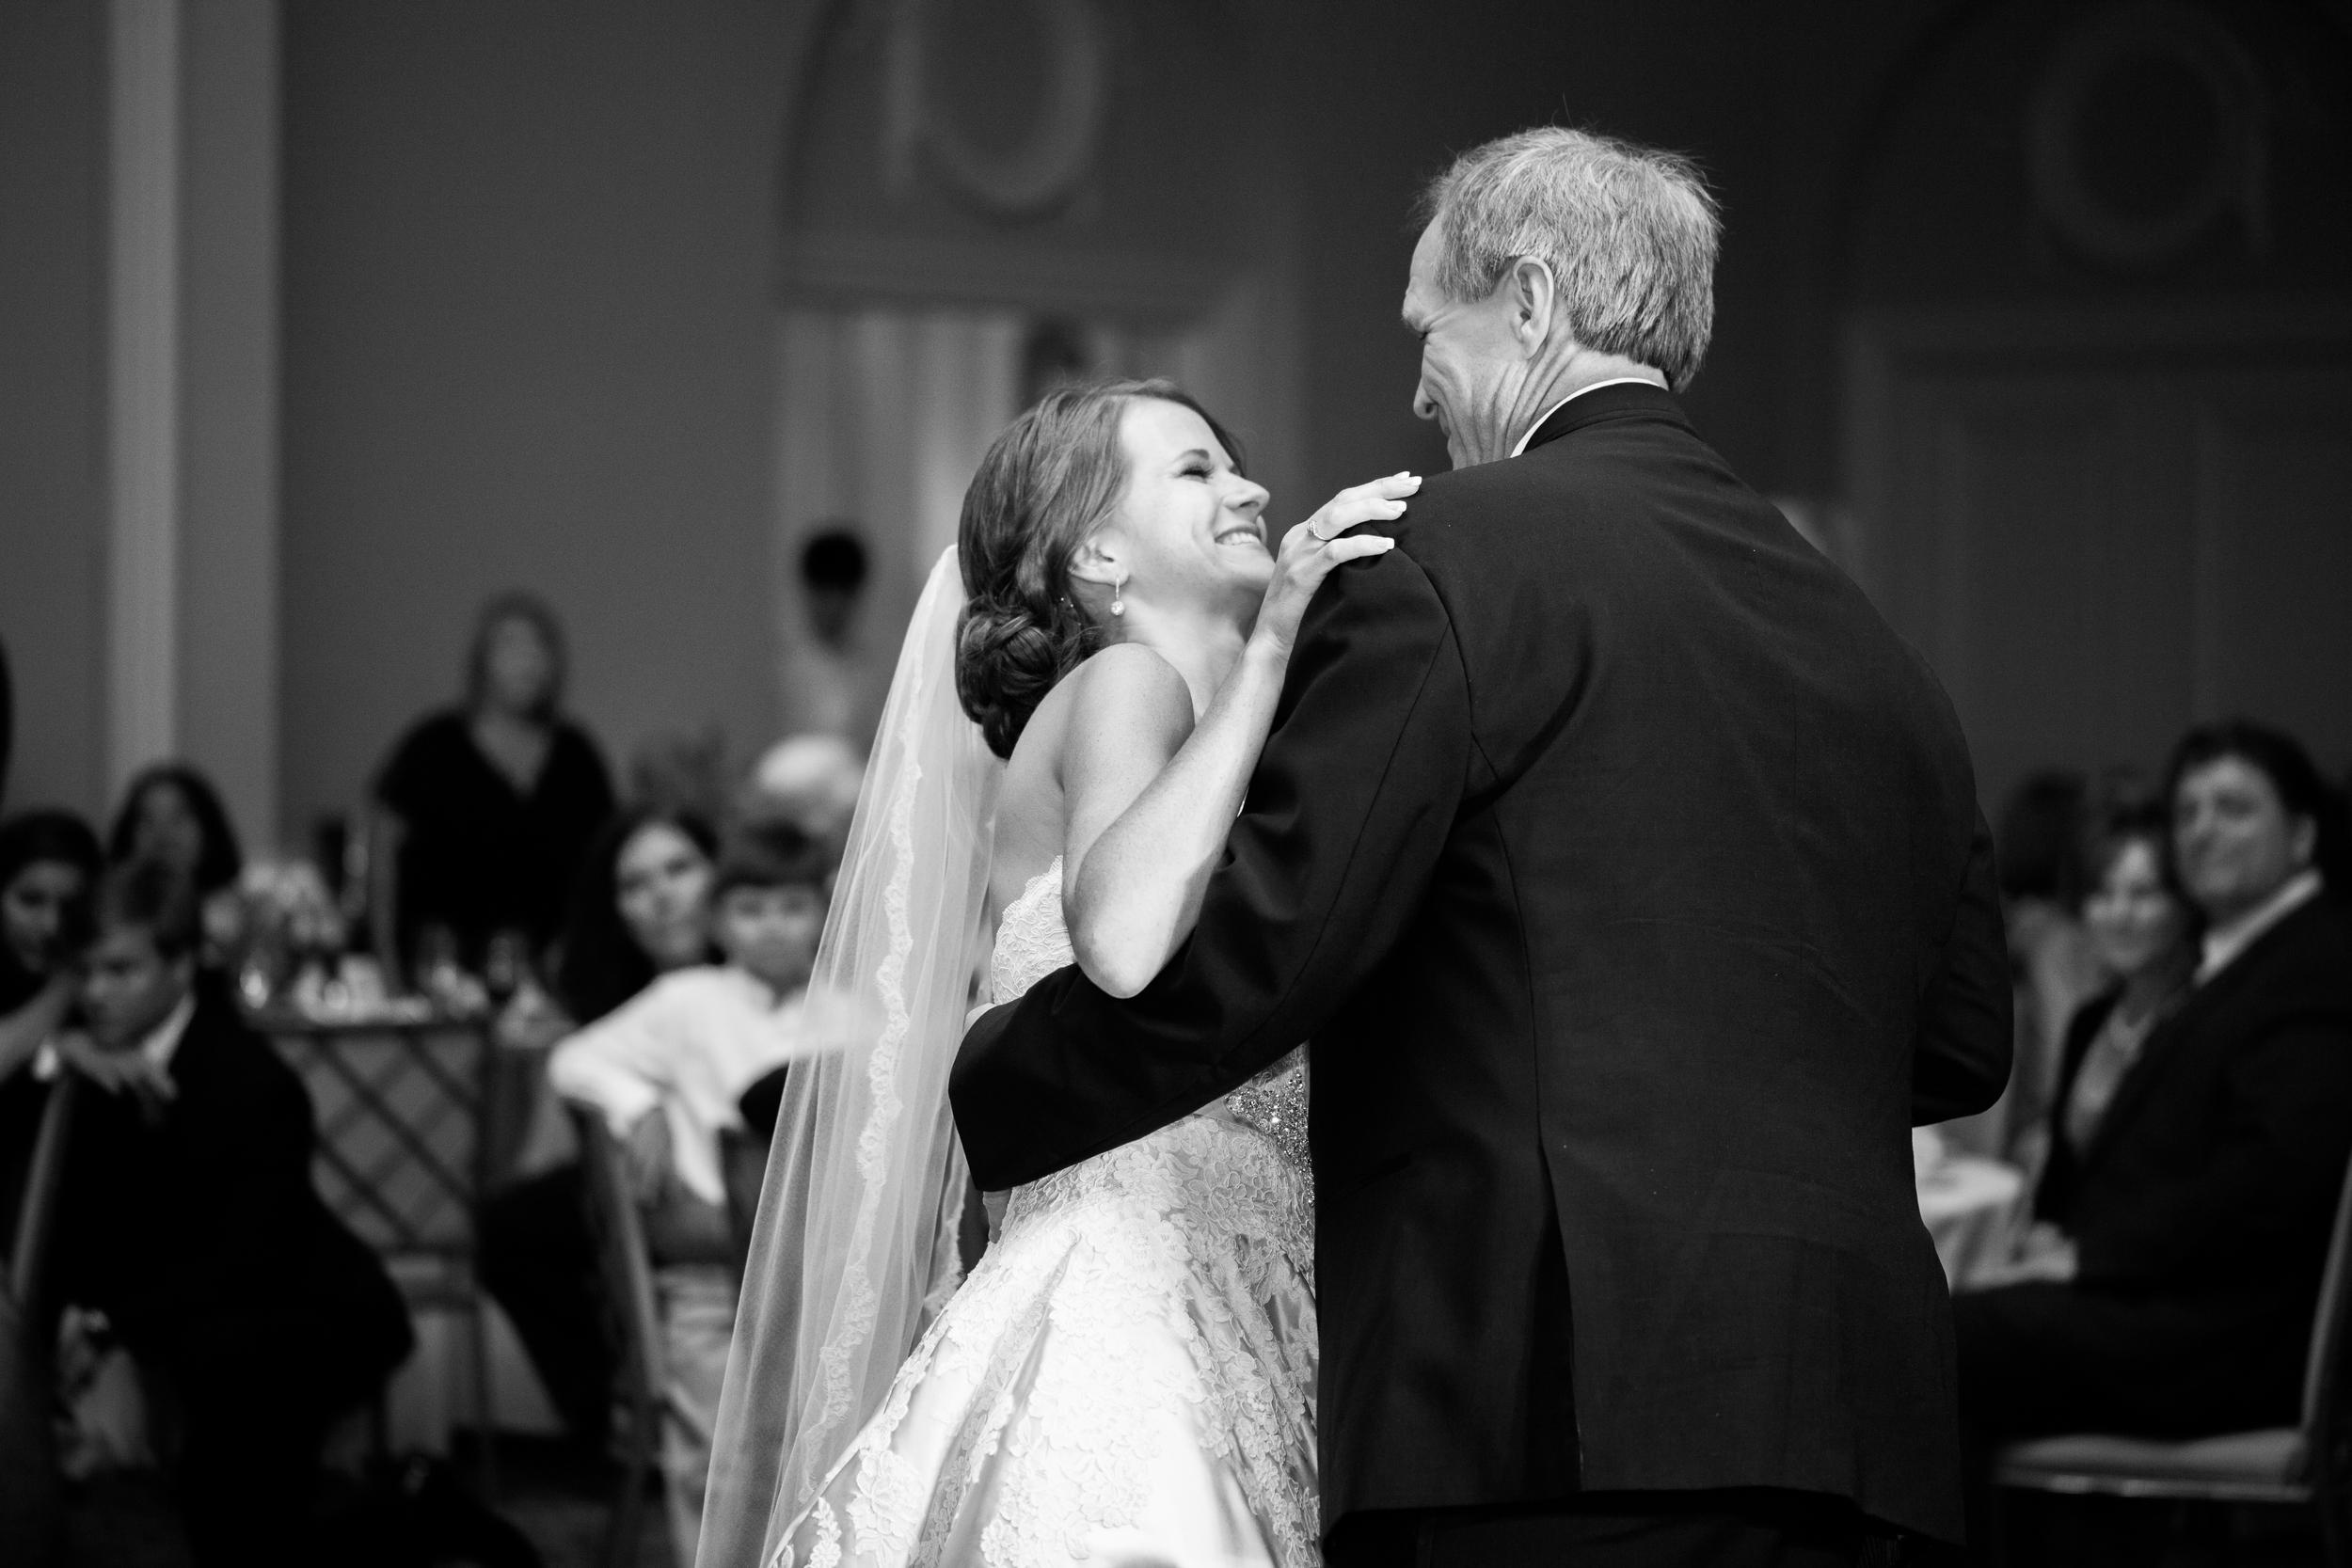 Brewbaker-Wedding-Montgomery-Alabama-Nick-Drollette-136.jpg